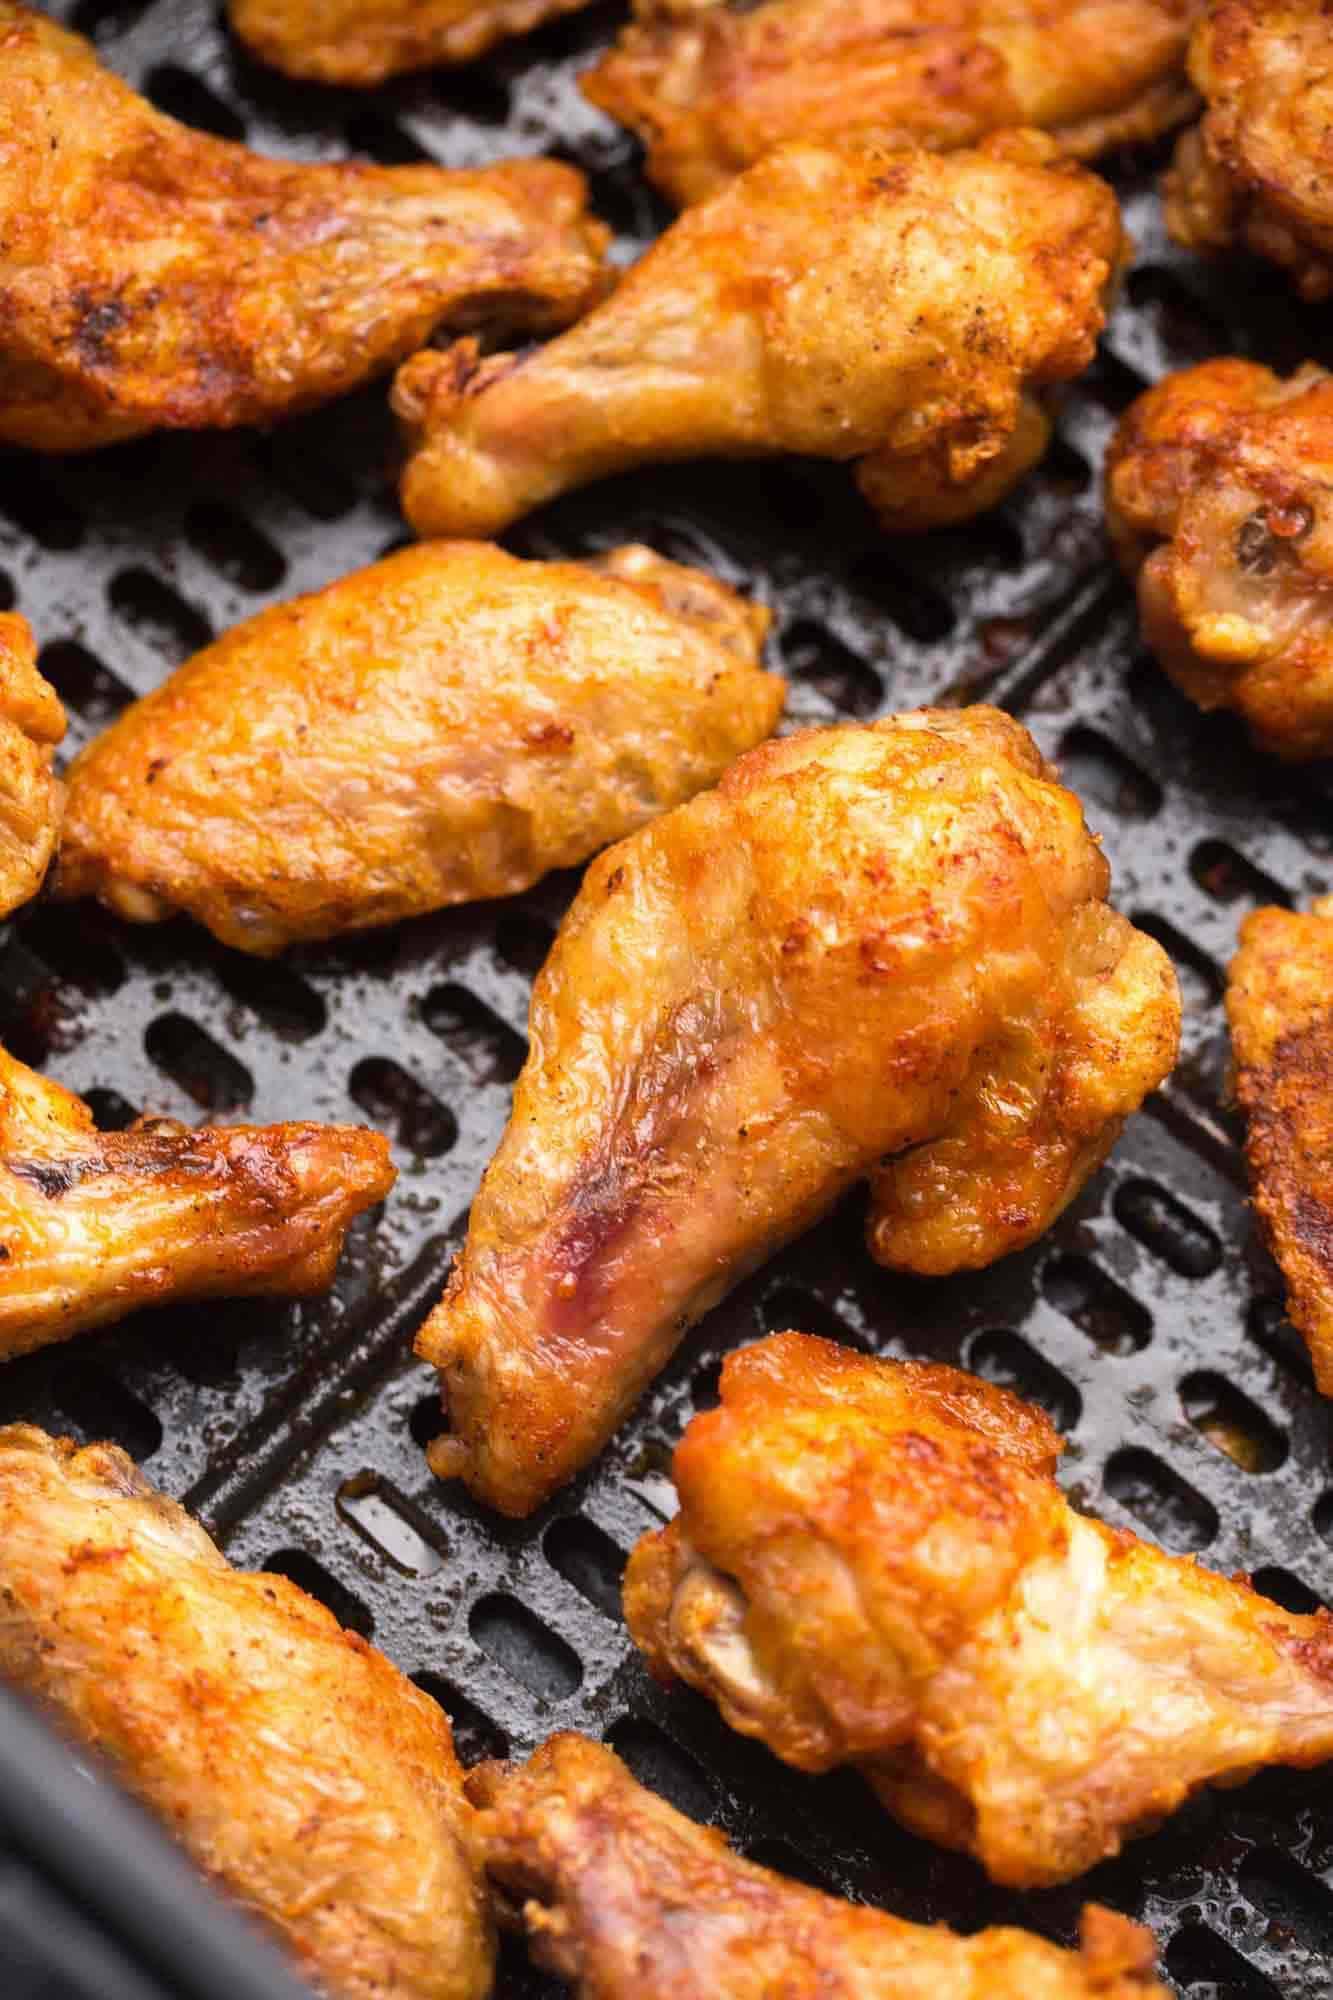 Air Fried chicken wings in a Cosori air fryer basket